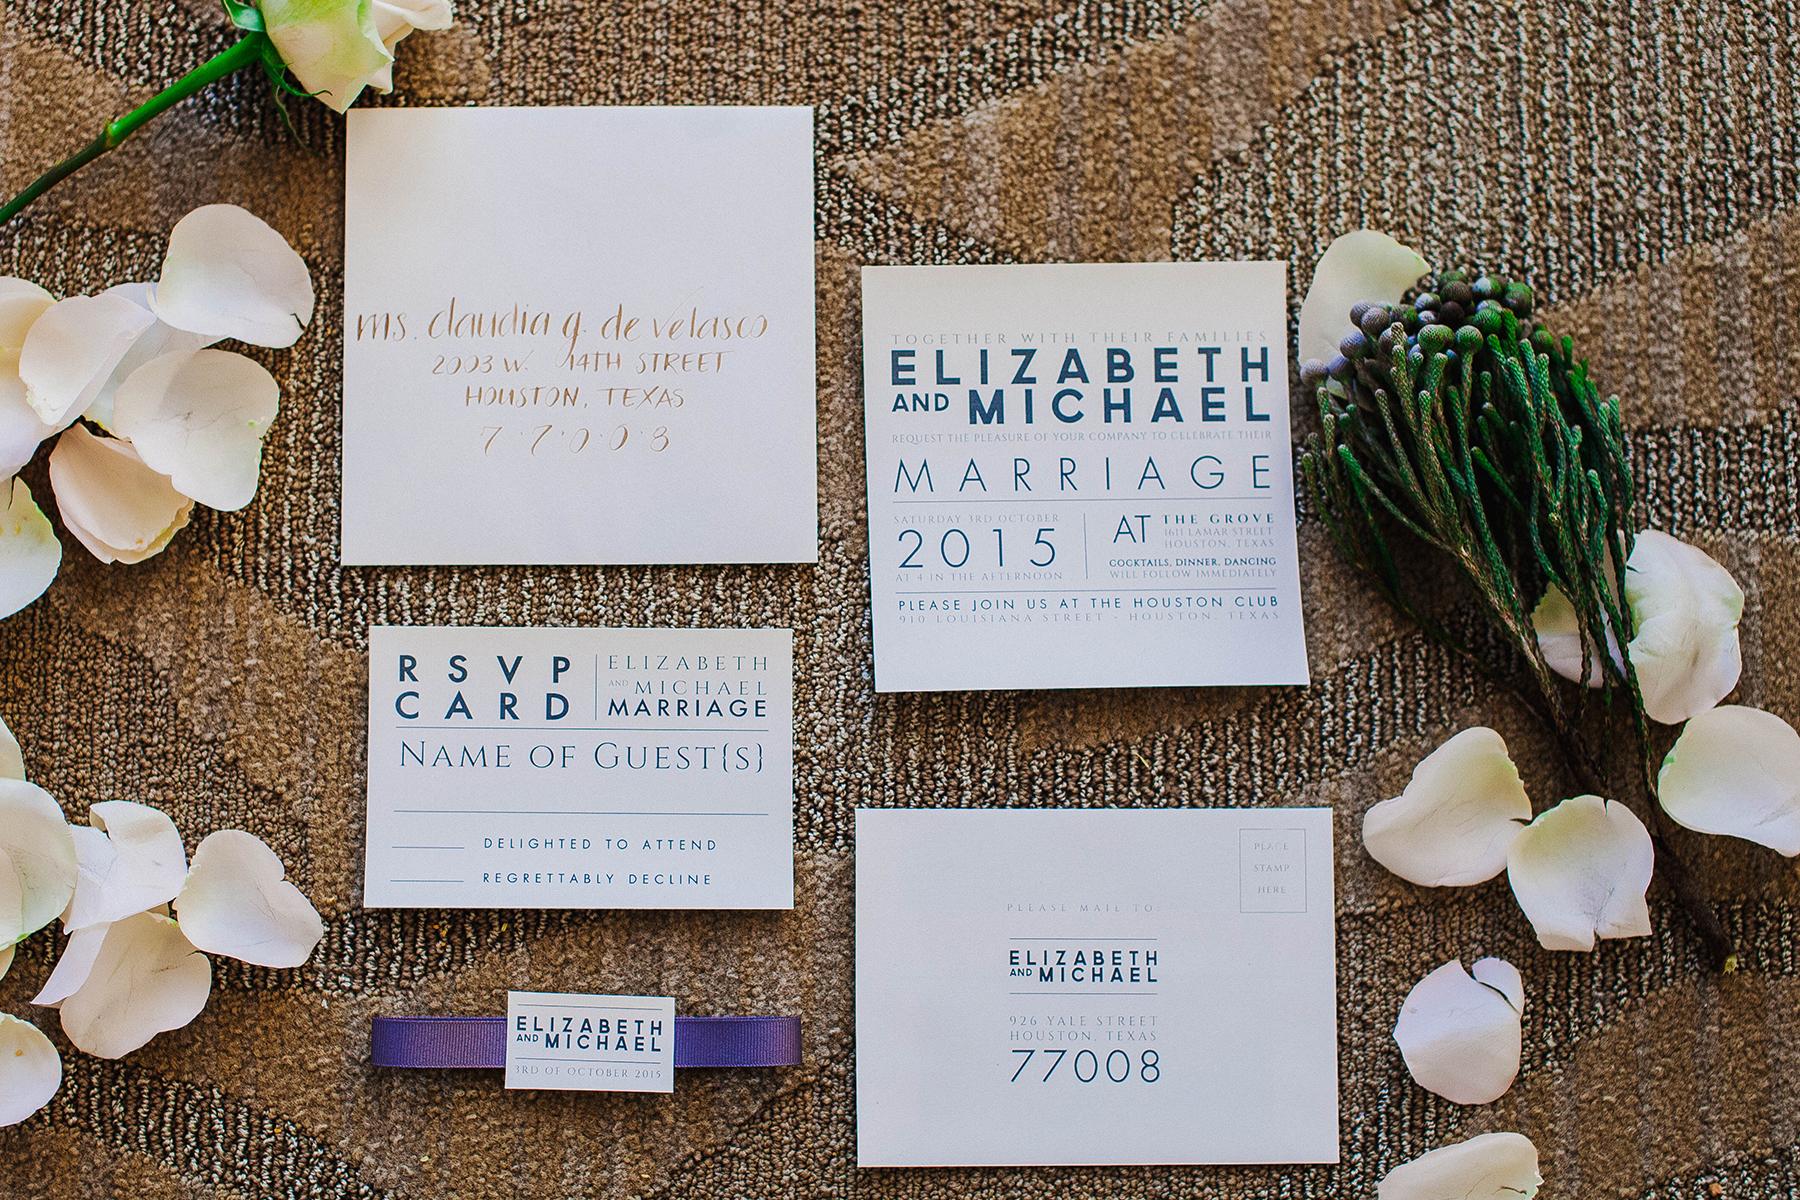 daytoremember.net | LeZu Photography | Wedding Stationery | A Day To Remember Houston Wedding Planning and Design